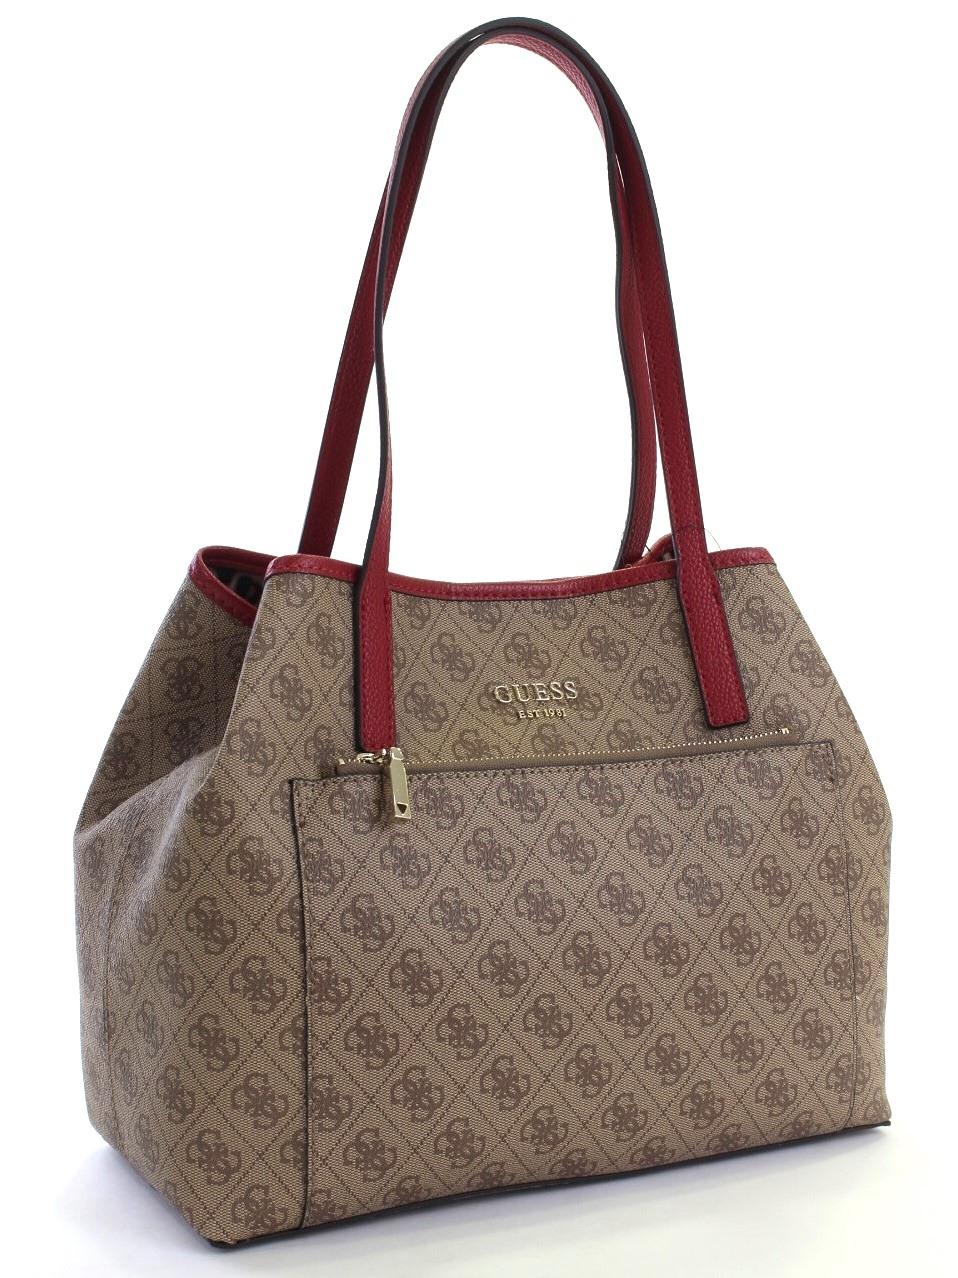 Handbags Guess - 465 HWSG69 95250